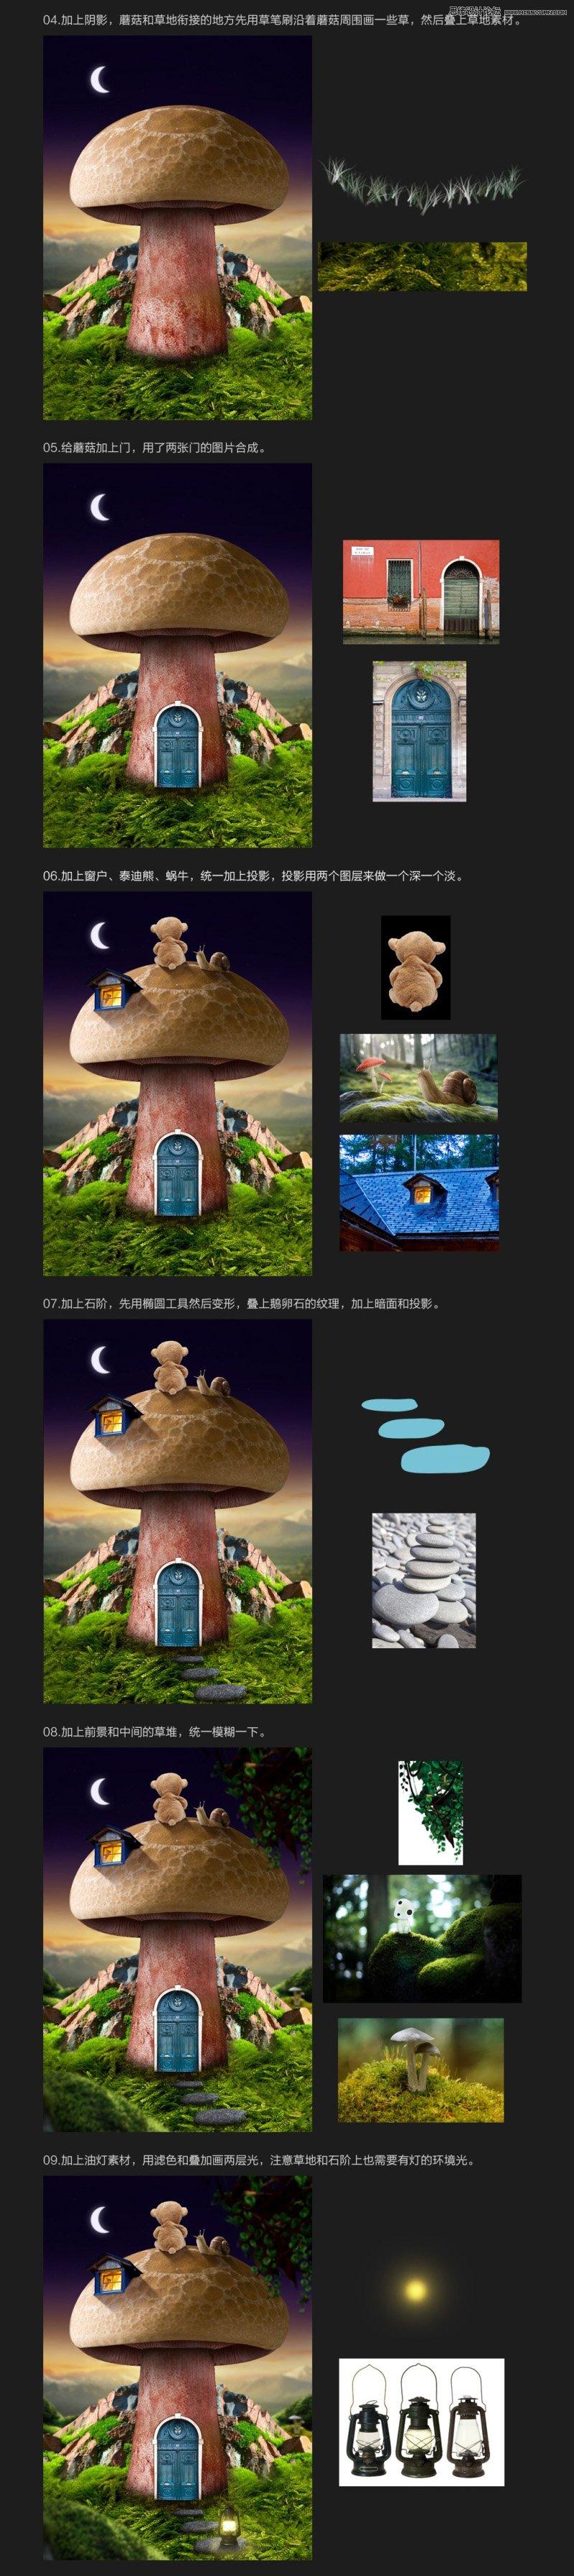 Photoshop合成梦幻童话风格的蘑菇房效果图